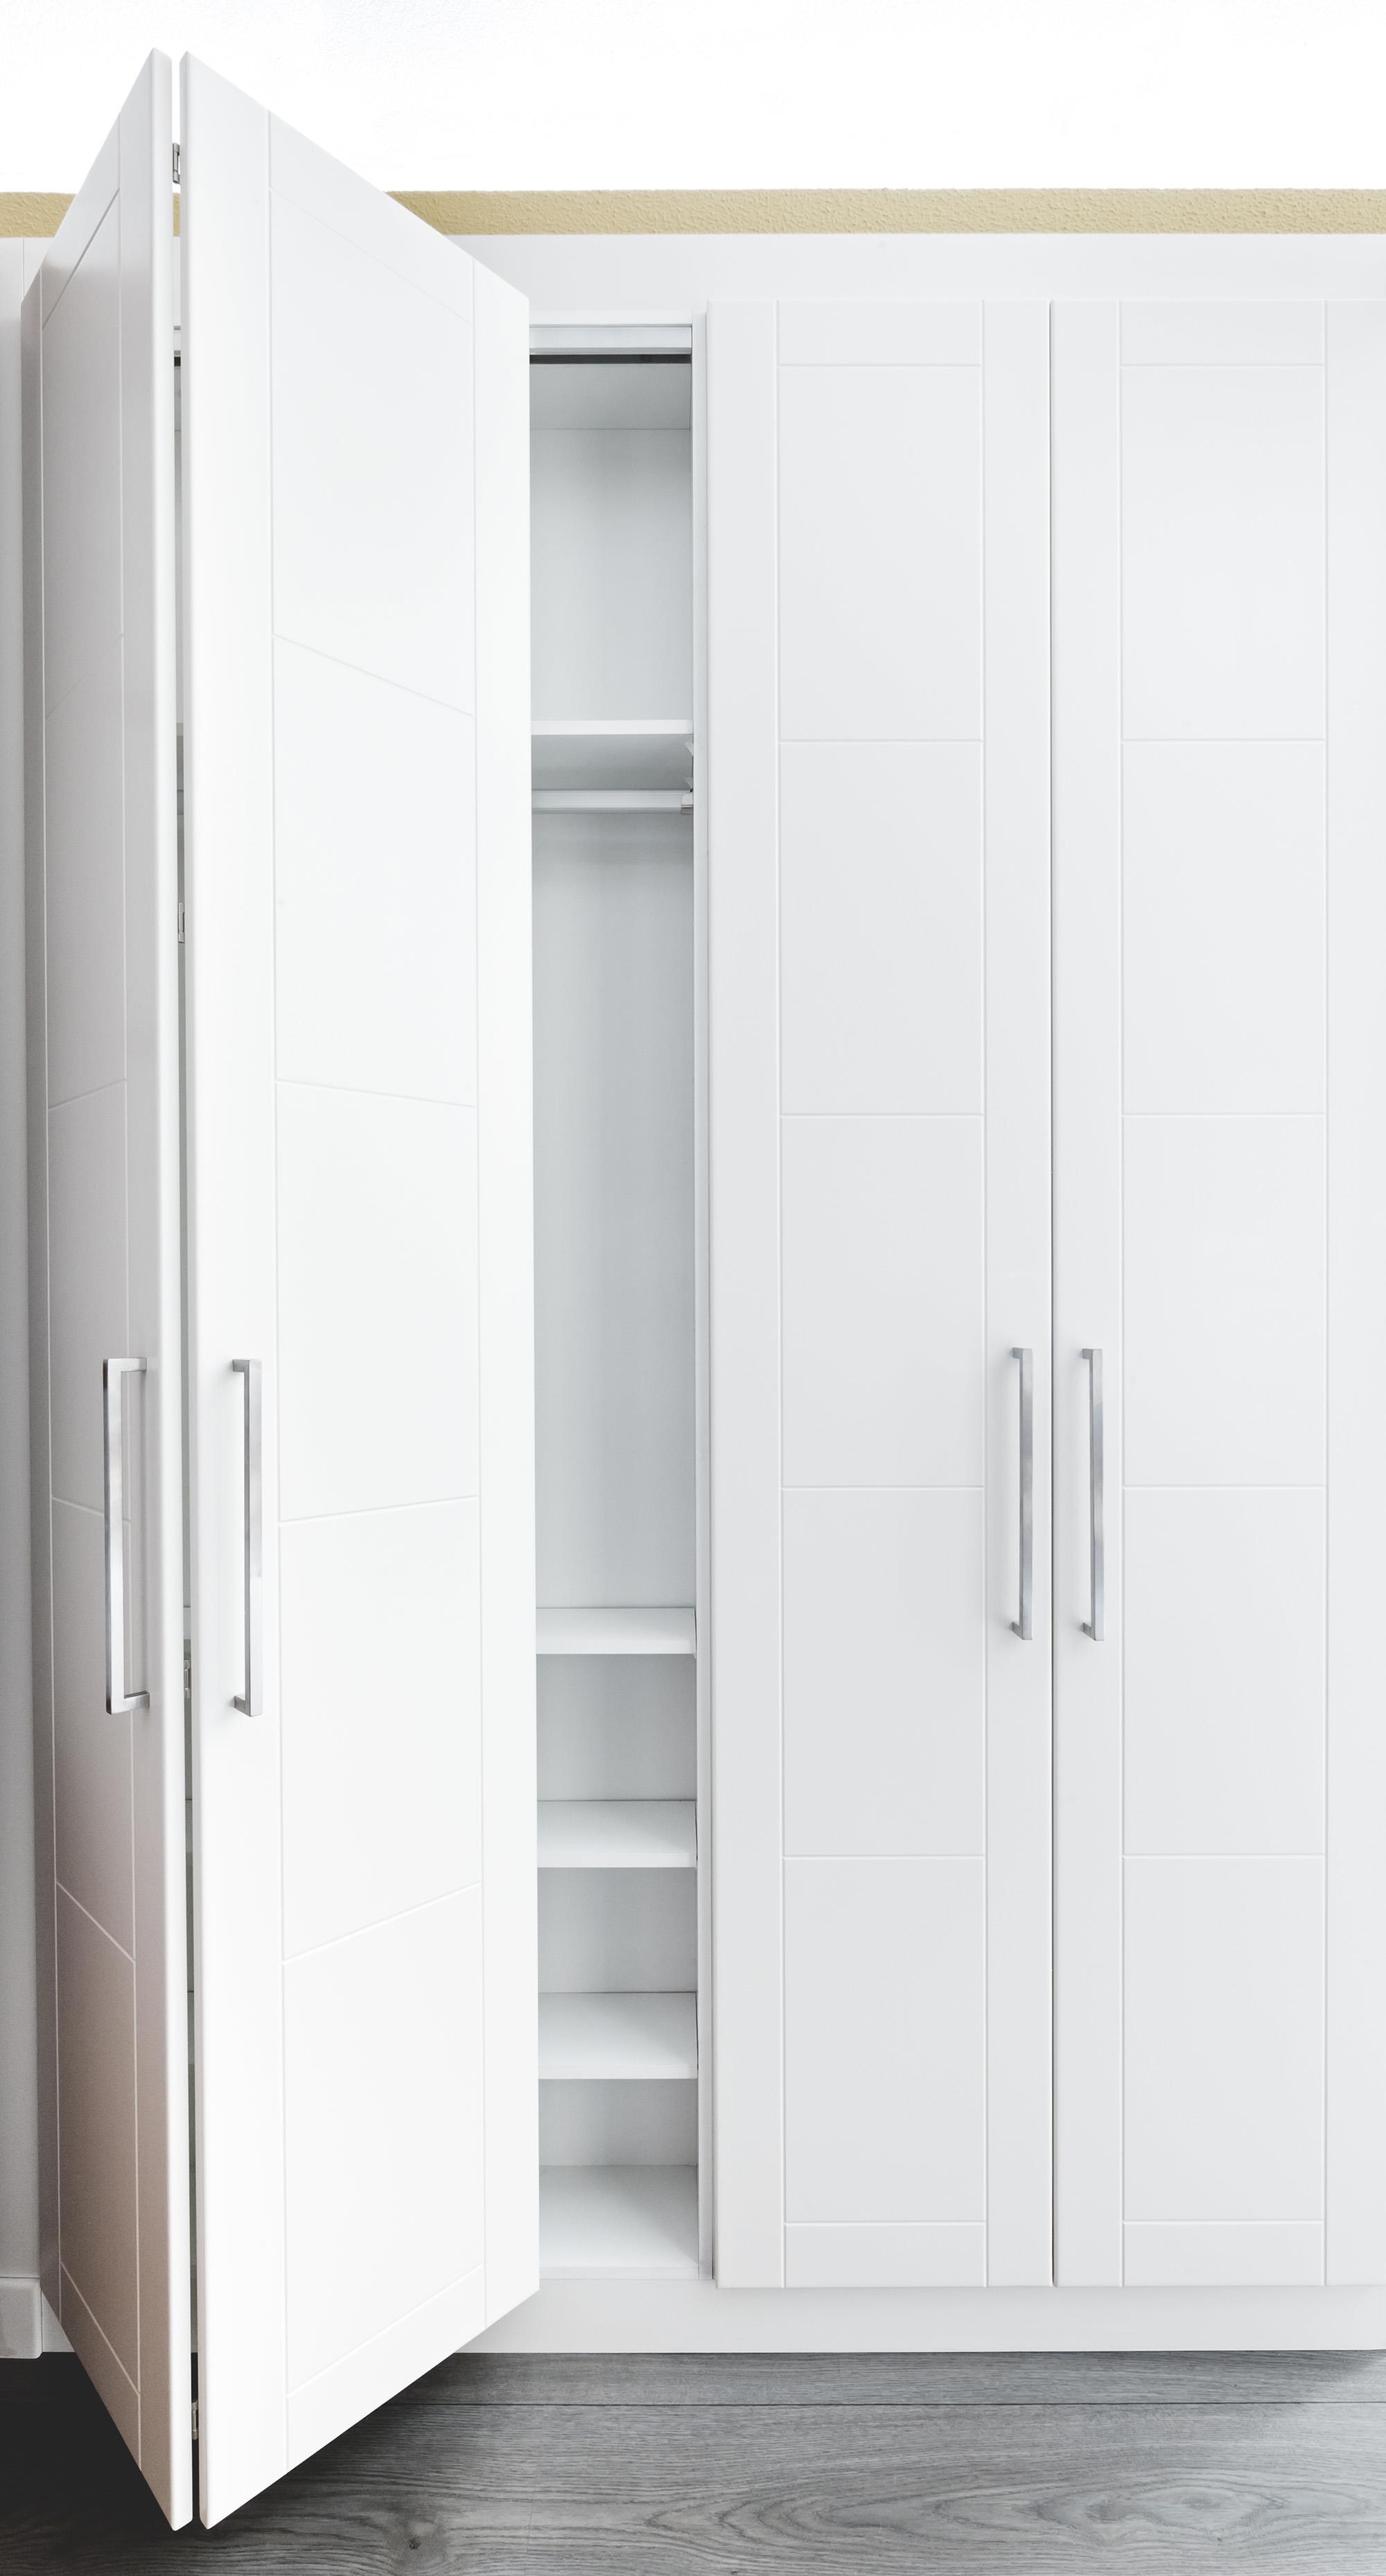 Armarios puertas plegables latest armario puertas - Armario puertas plegables ...